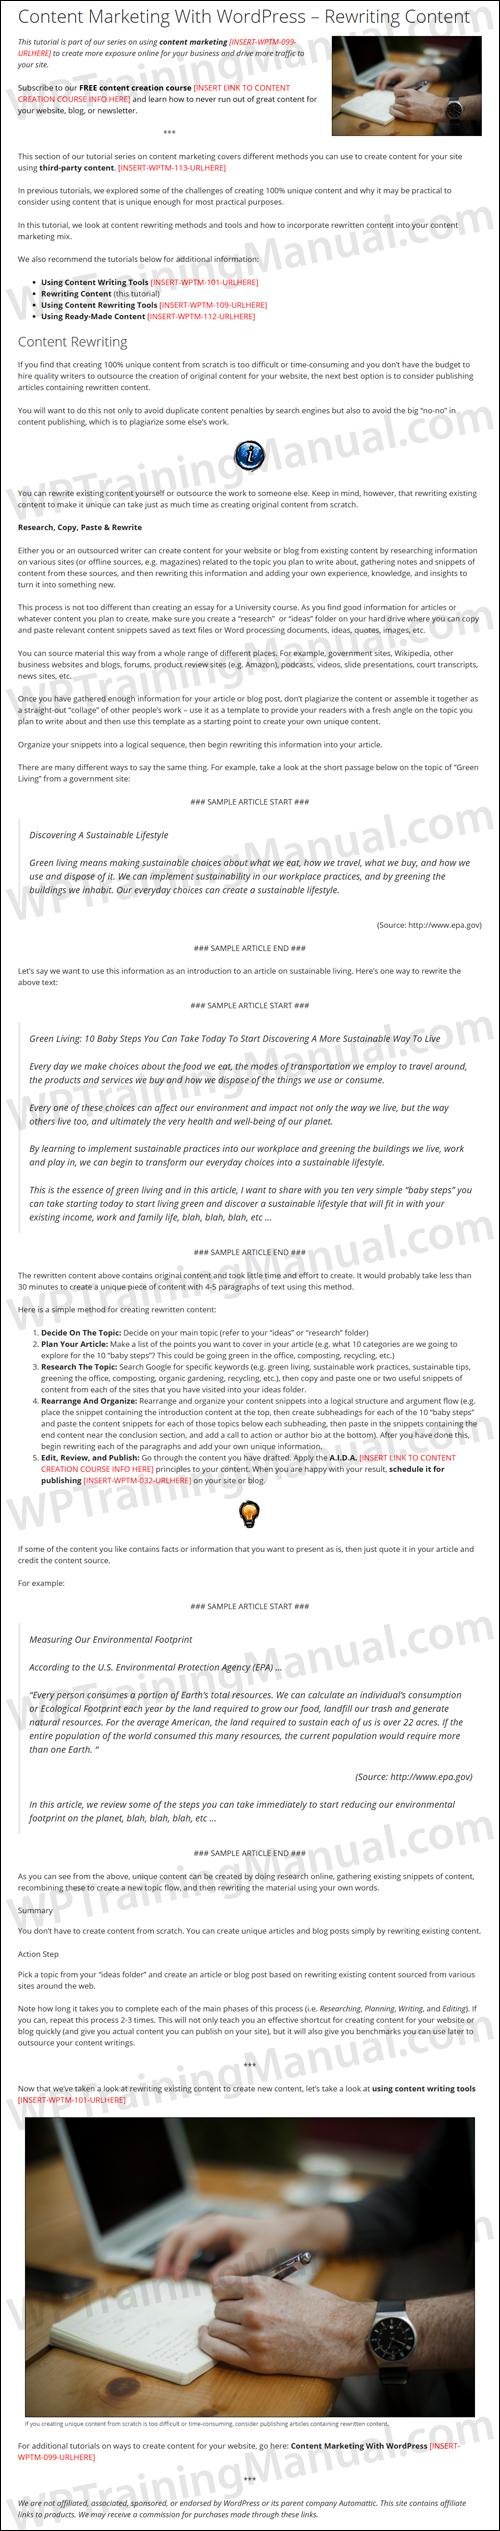 White Label Tutorial: Content Marketing With WordPress - Rewriting Content - WPTrainingManual.com